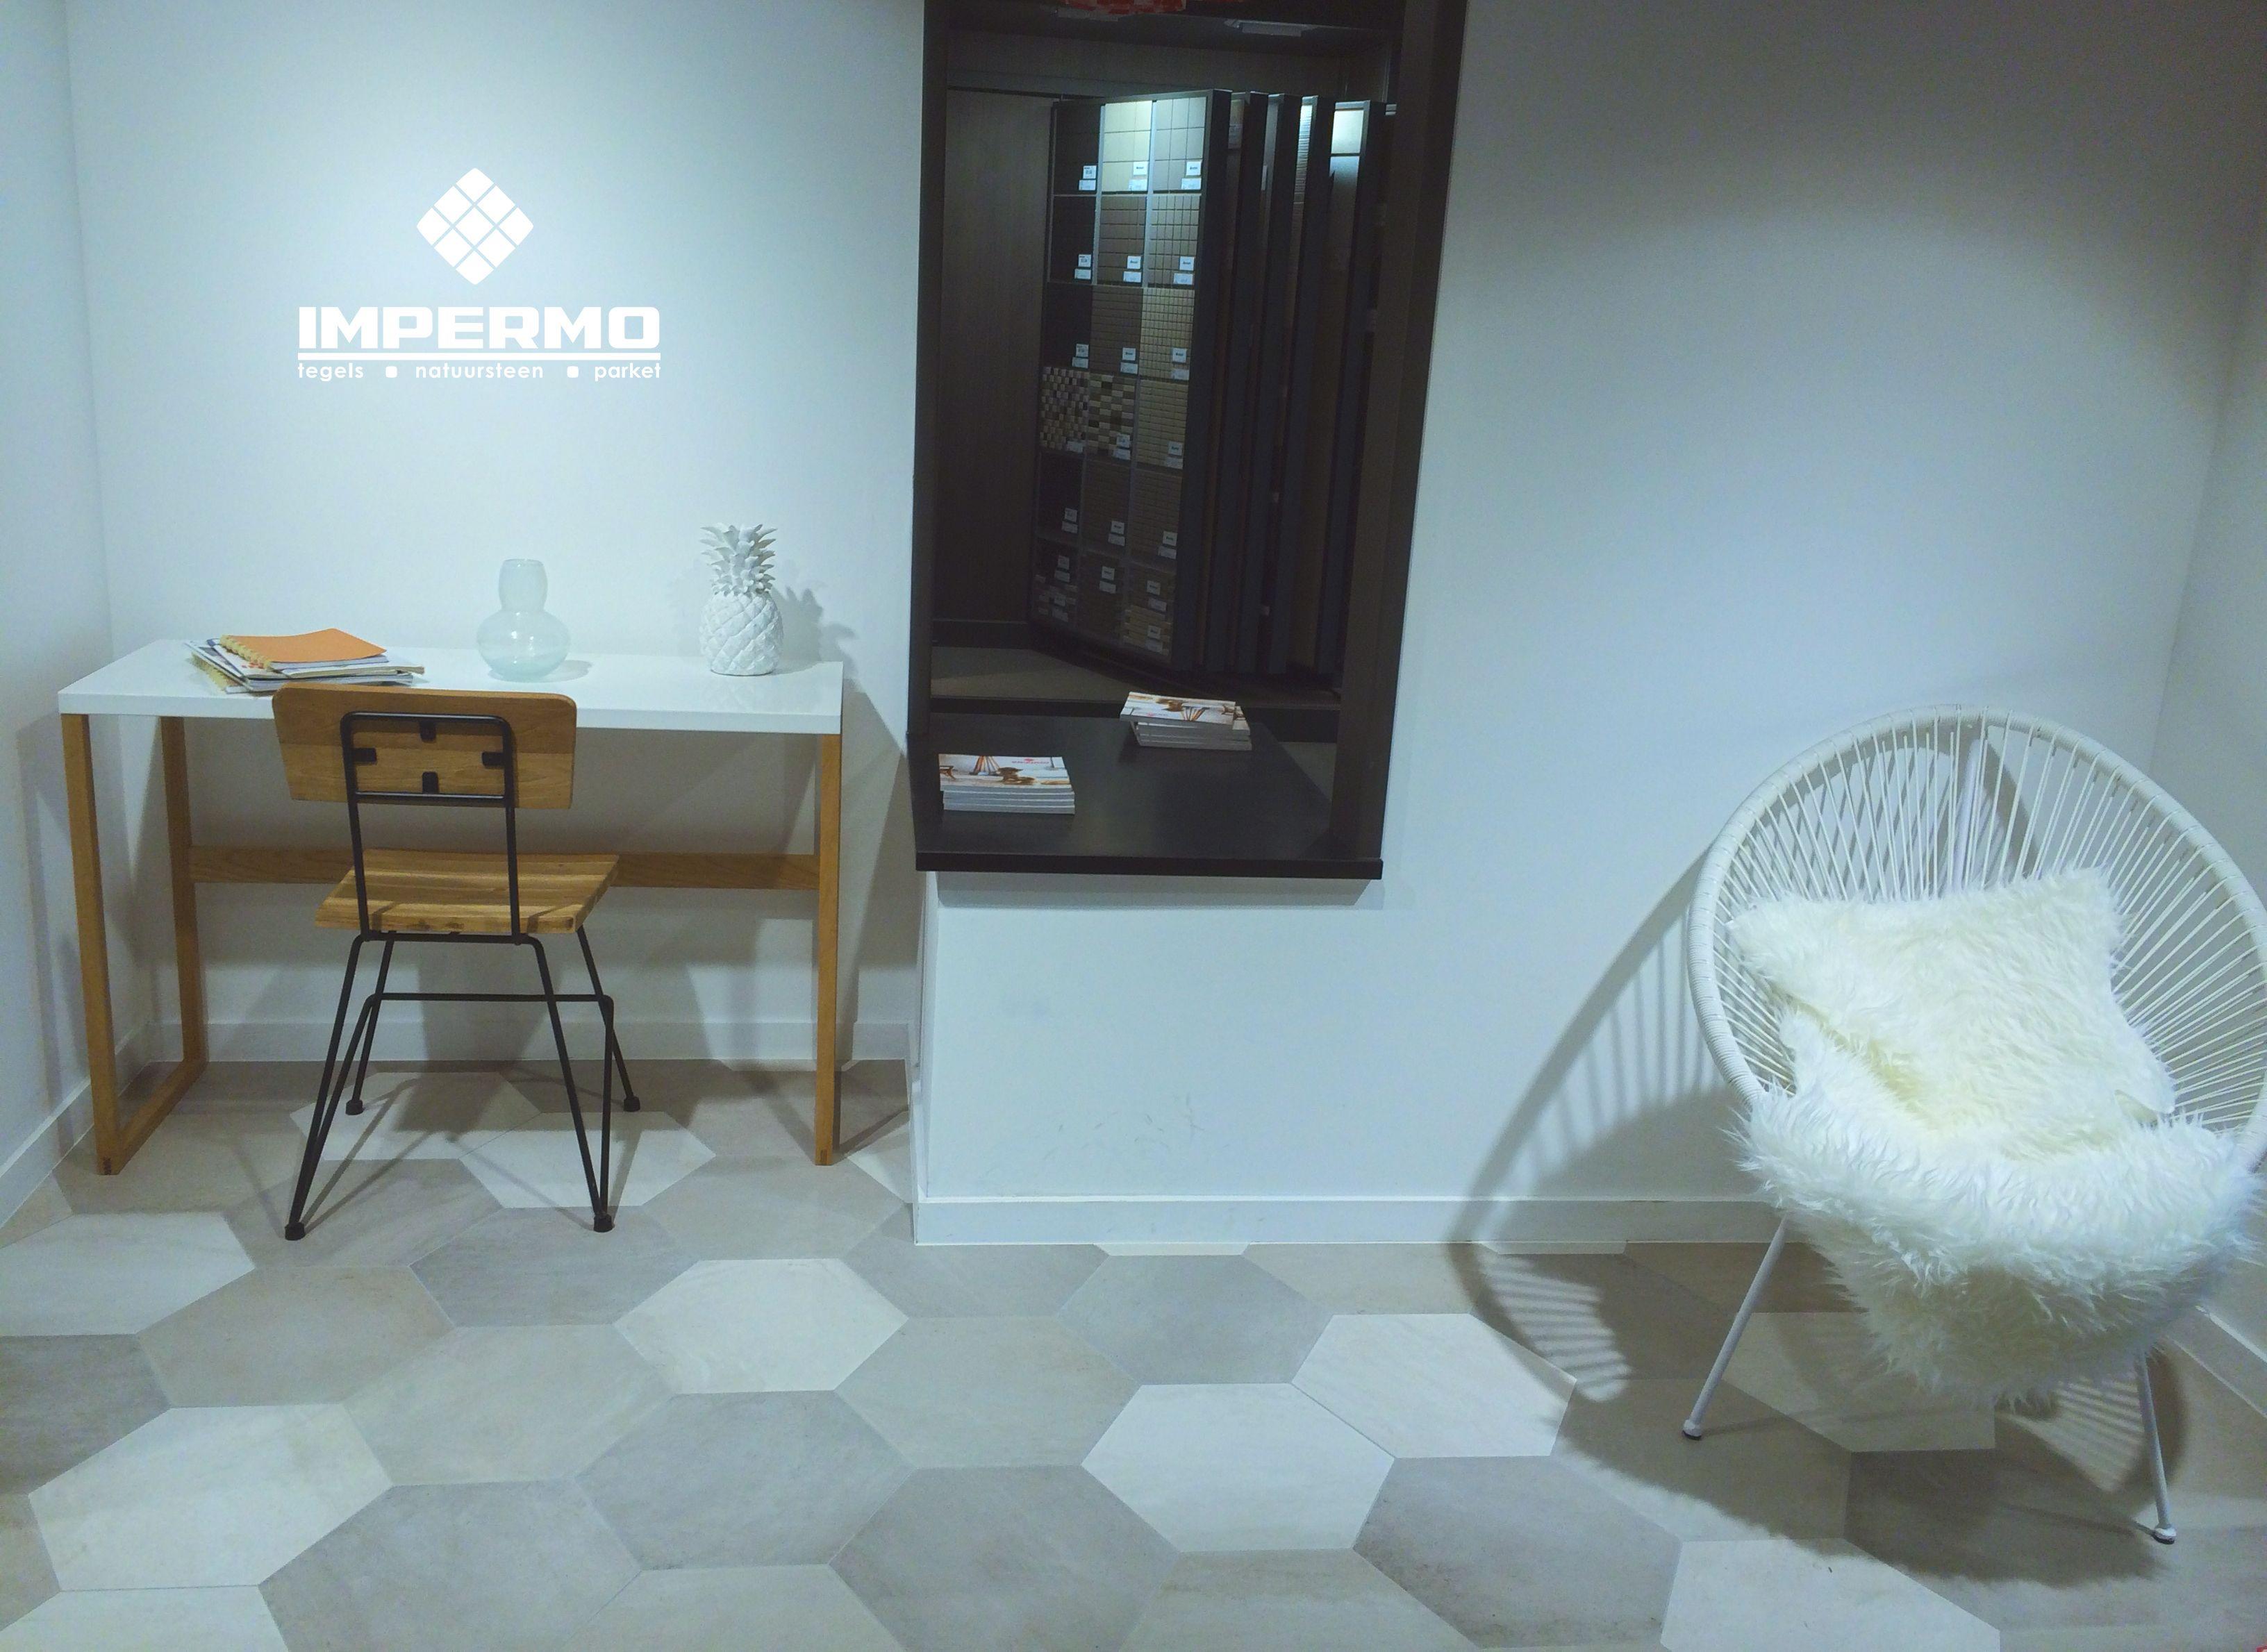 impermo keukentegels : Nieuw Villa Esagono Hexa Tile Tegels In Keramiek